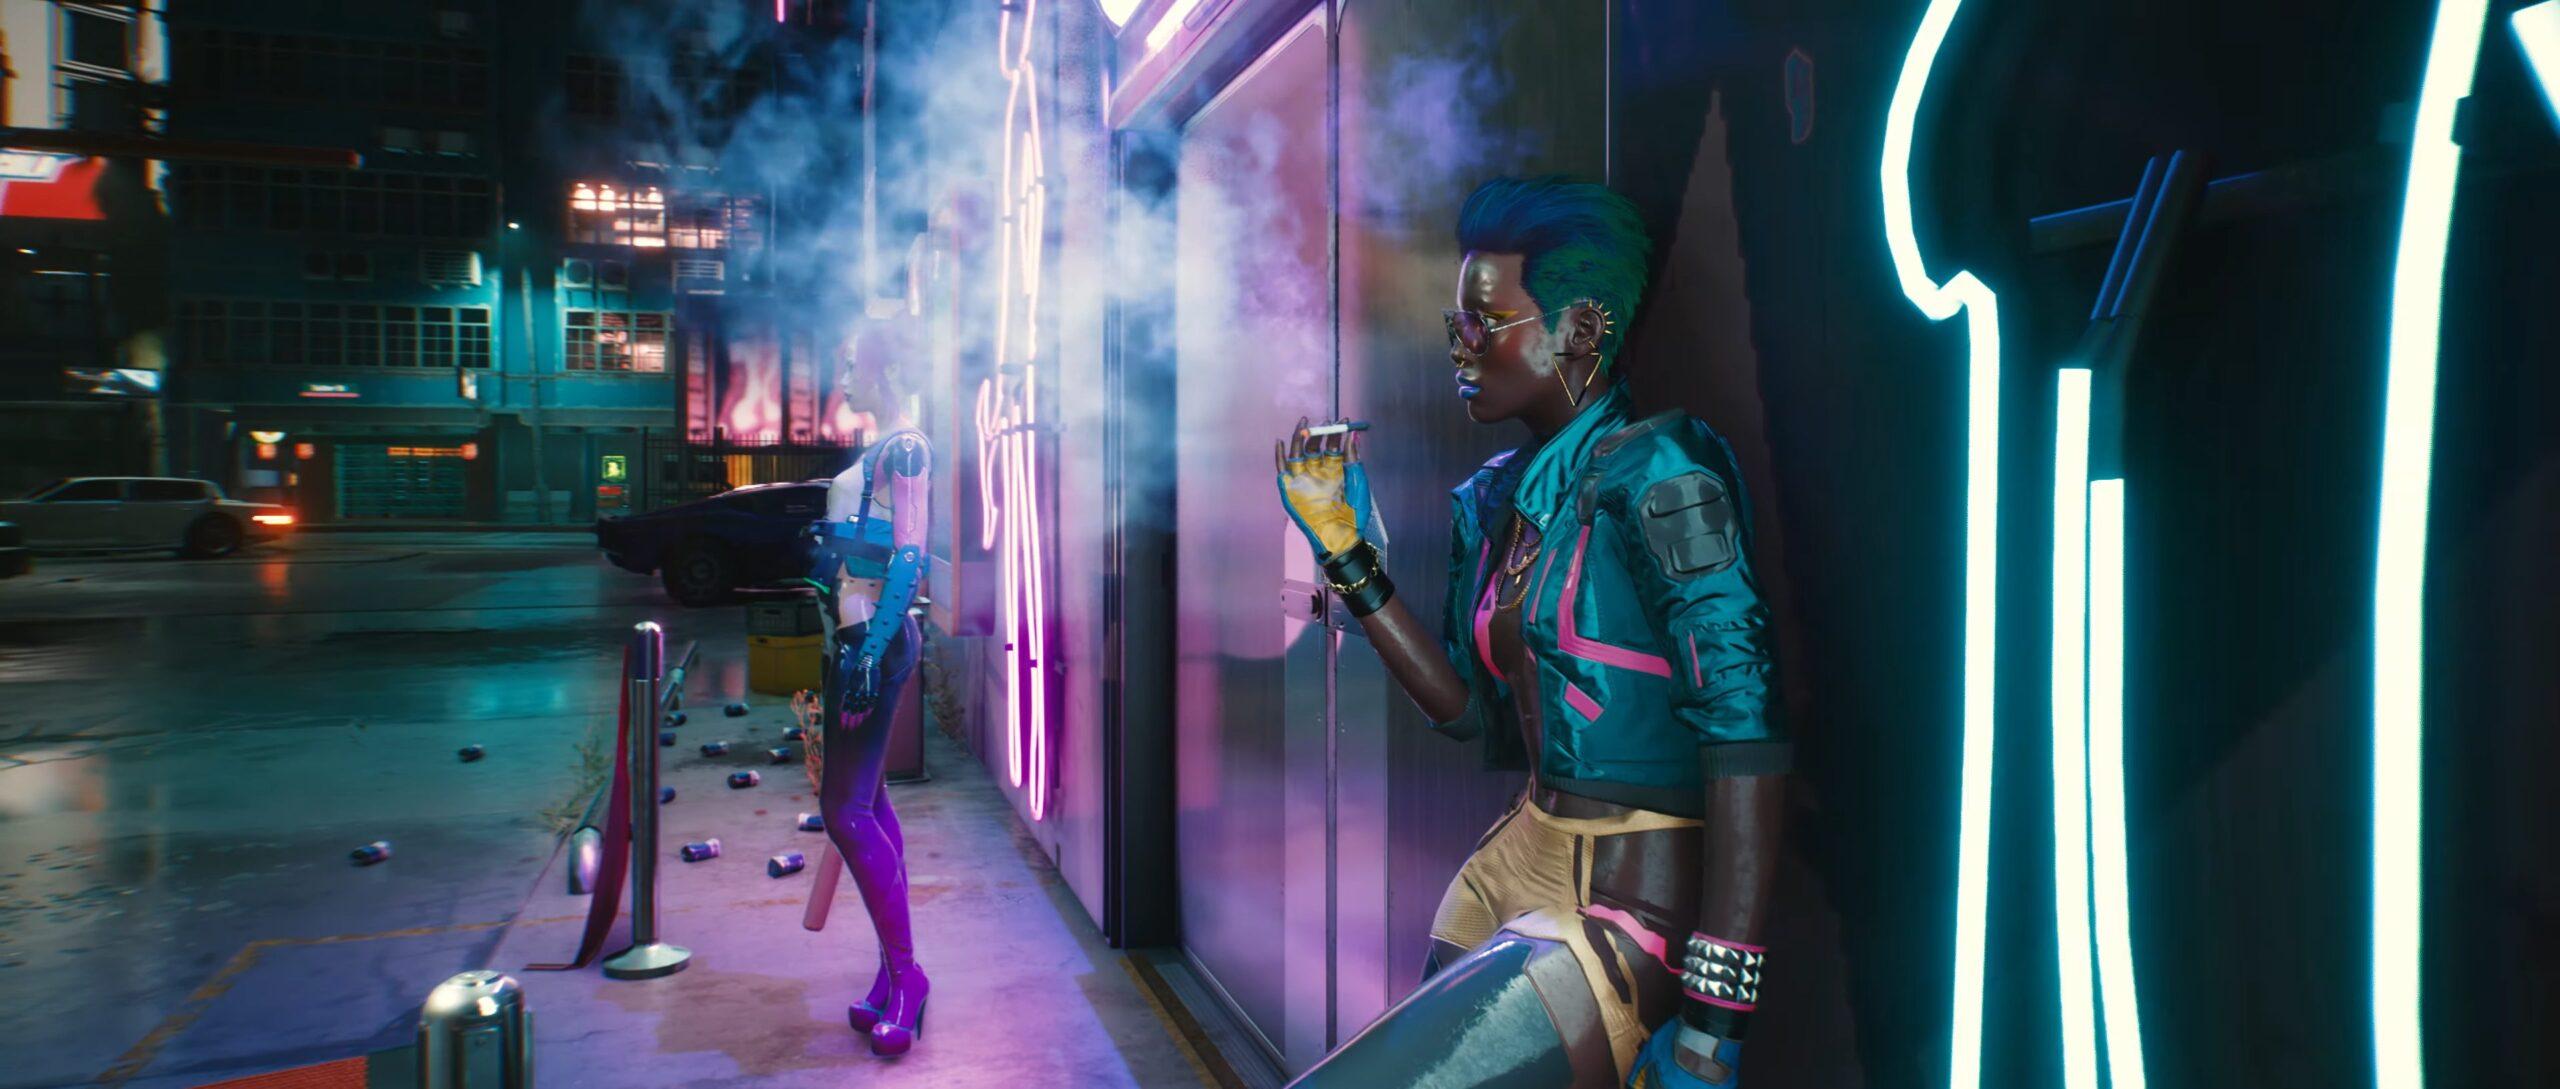 Cyberpunk 2077 — Gangs Of Night City 3 26 Screenshot